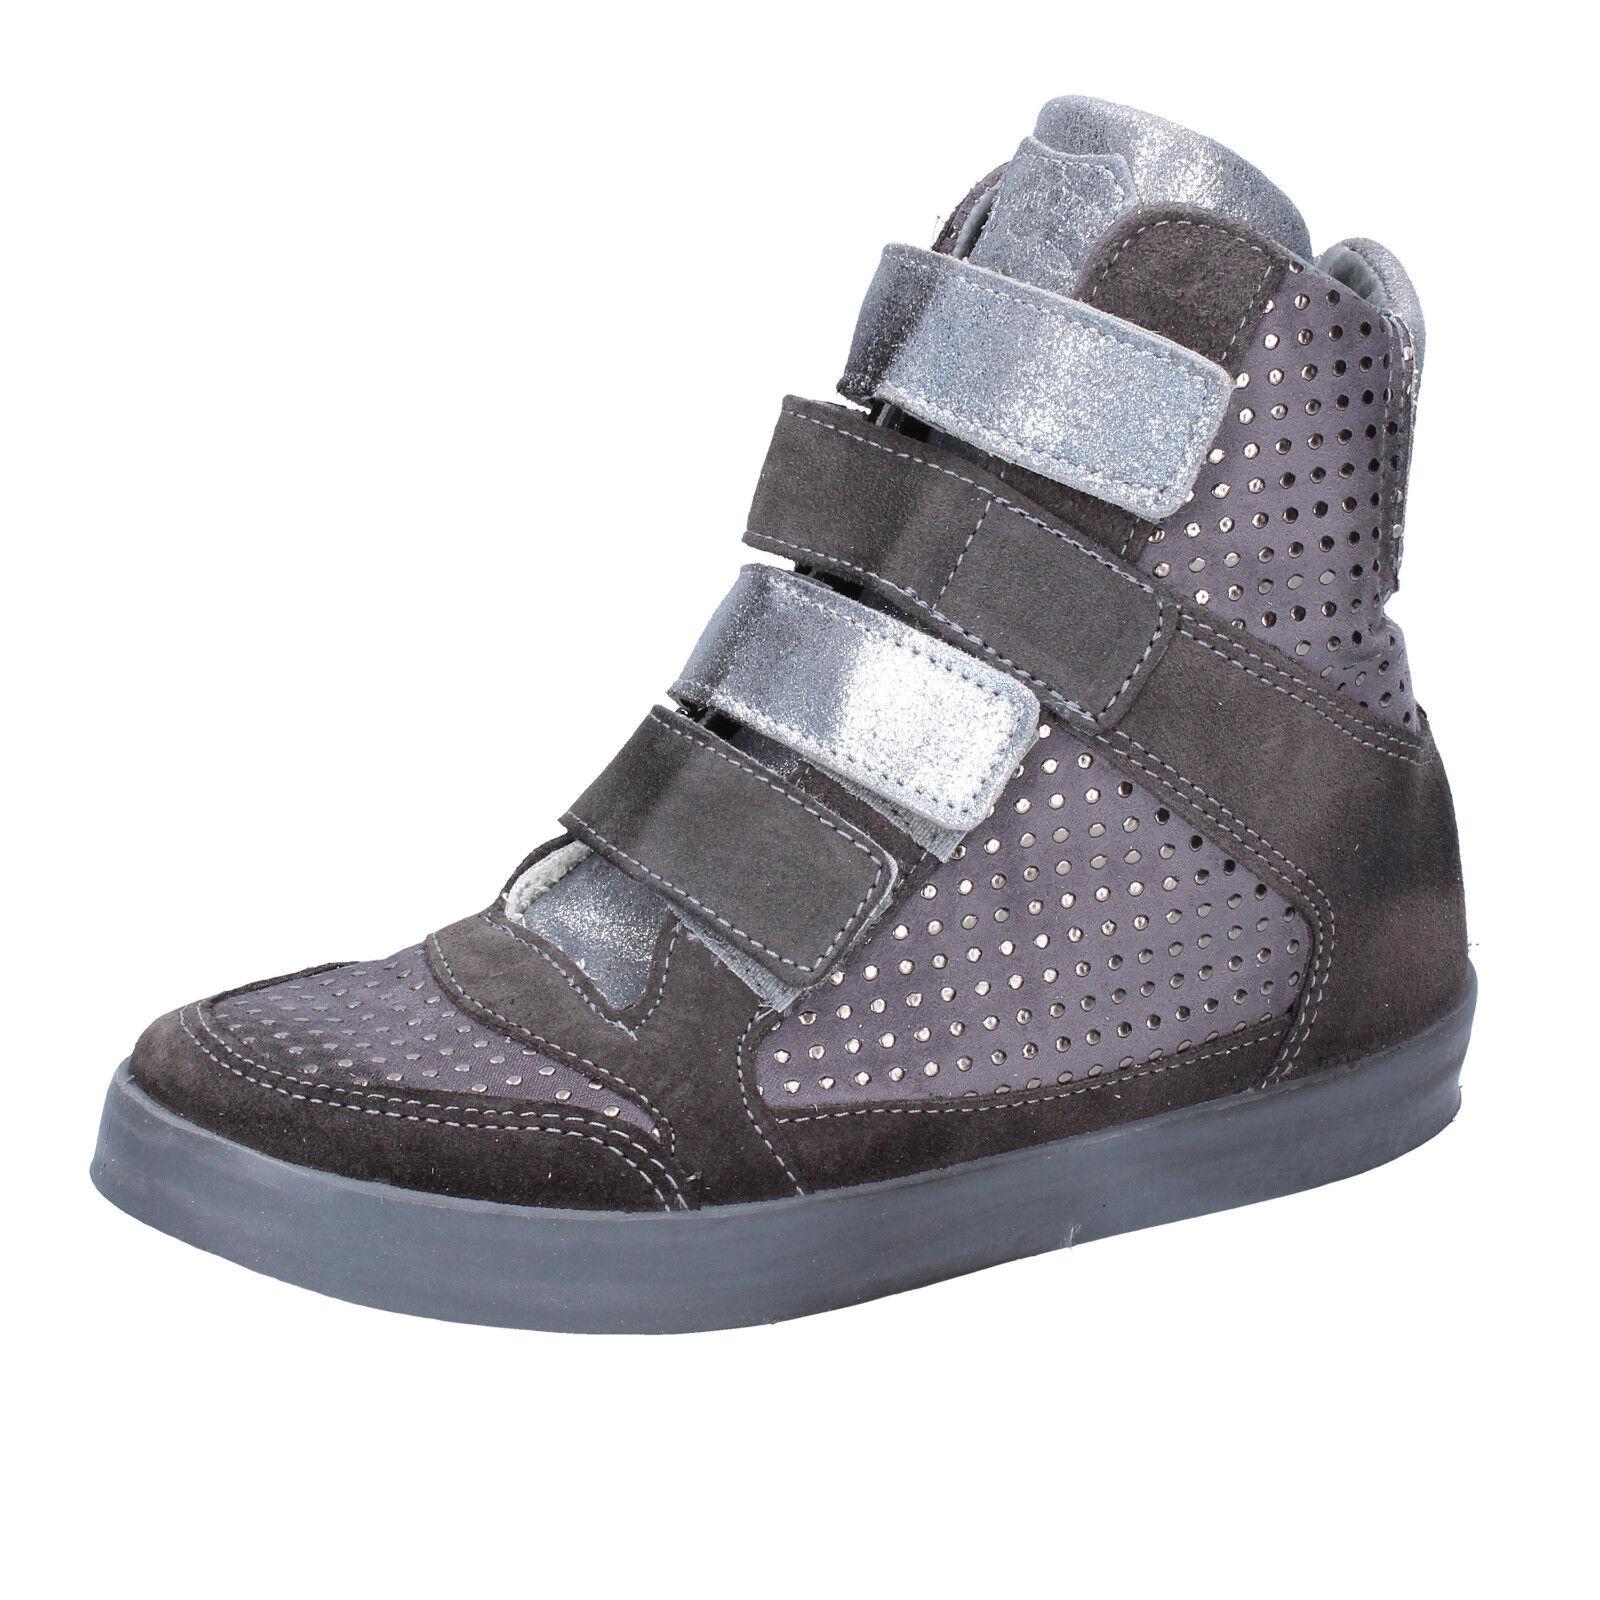 femmes chaussuresBEVERLY HILLS POLO CLUB 6 (EU36) sneakers gris suede AJ15-36